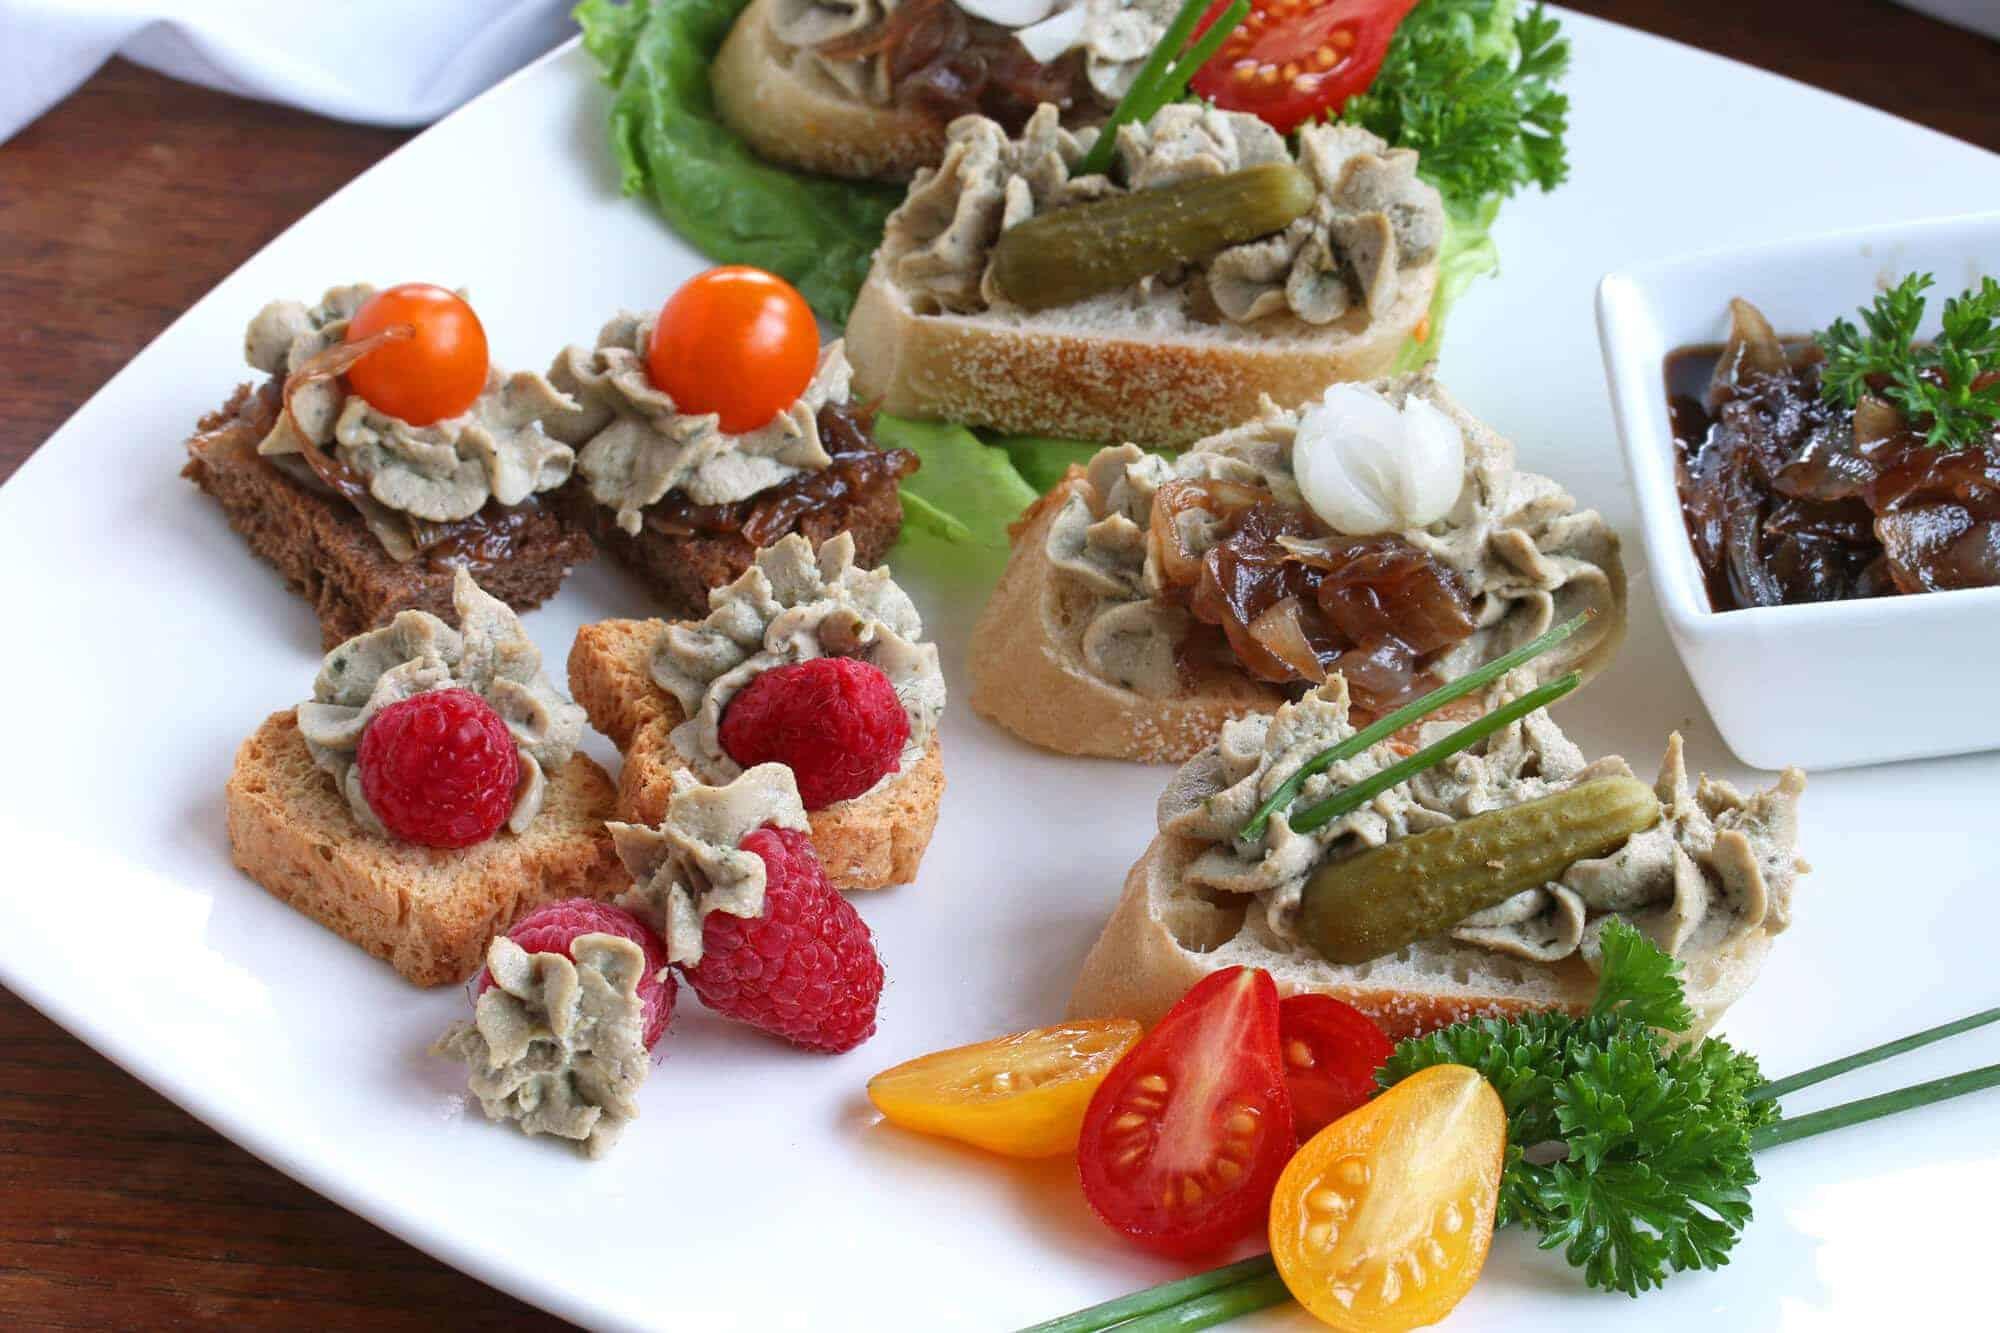 French entertaining part ii nouvelle cuisine alexian le creuset giveaway the daring gourmet for Nouvelle cuisine